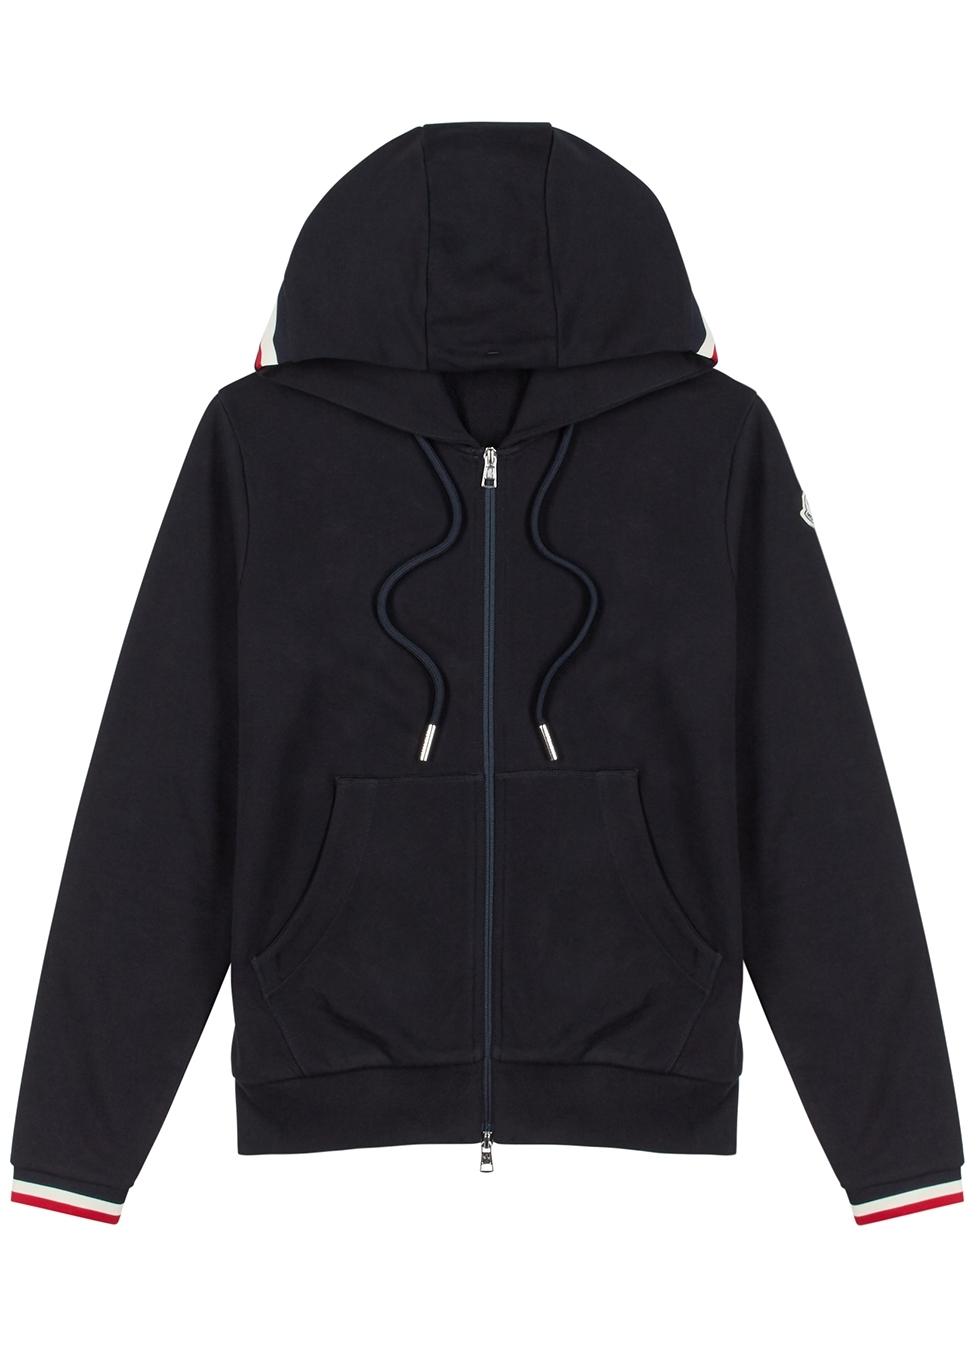 9aa8edc28199 Moncler - Designer Jackets